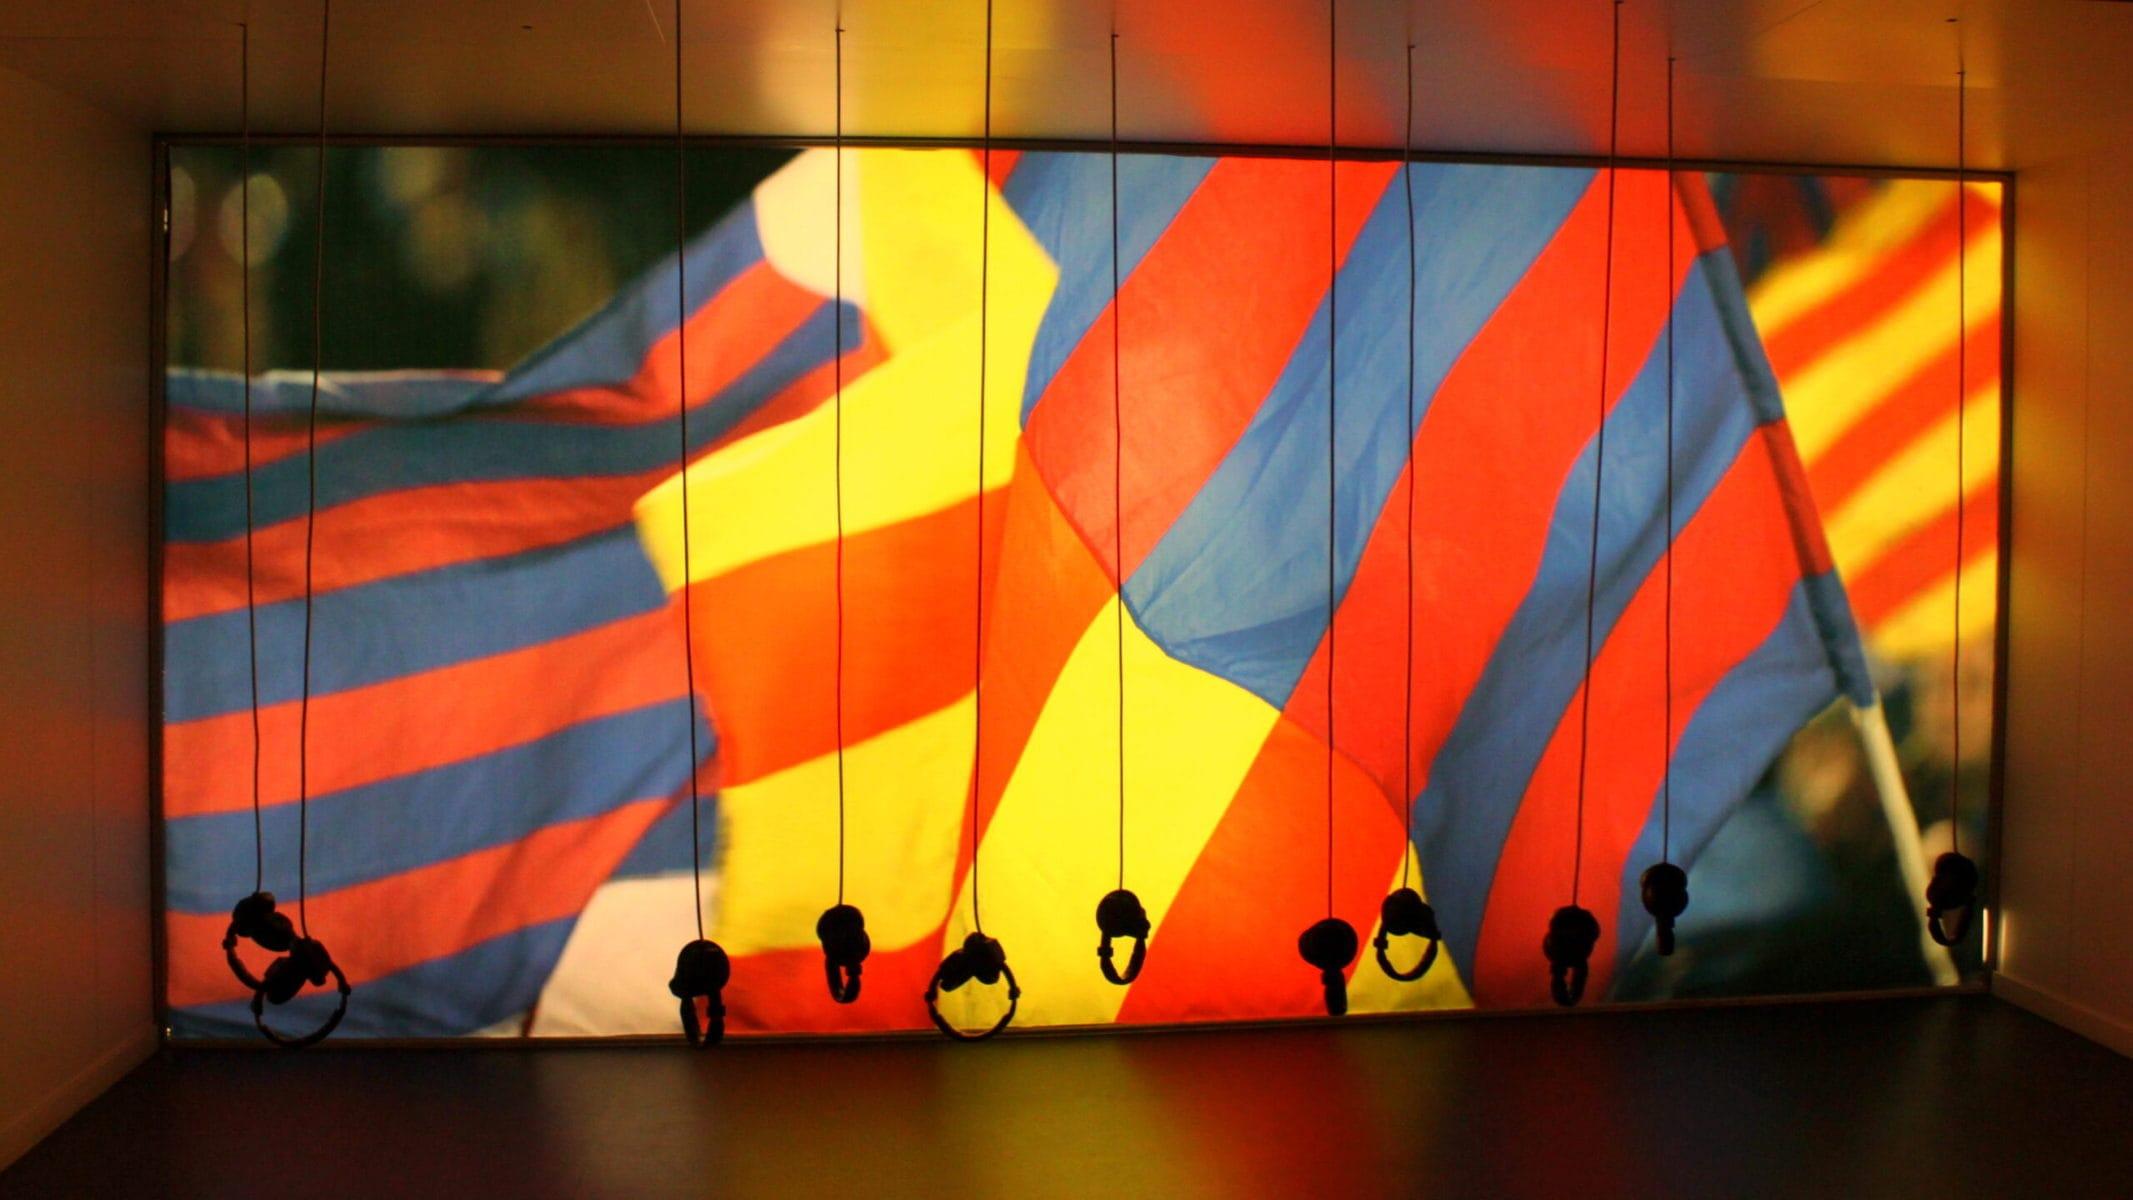 Medienraum, Camp Nou Stadion, Barcelona